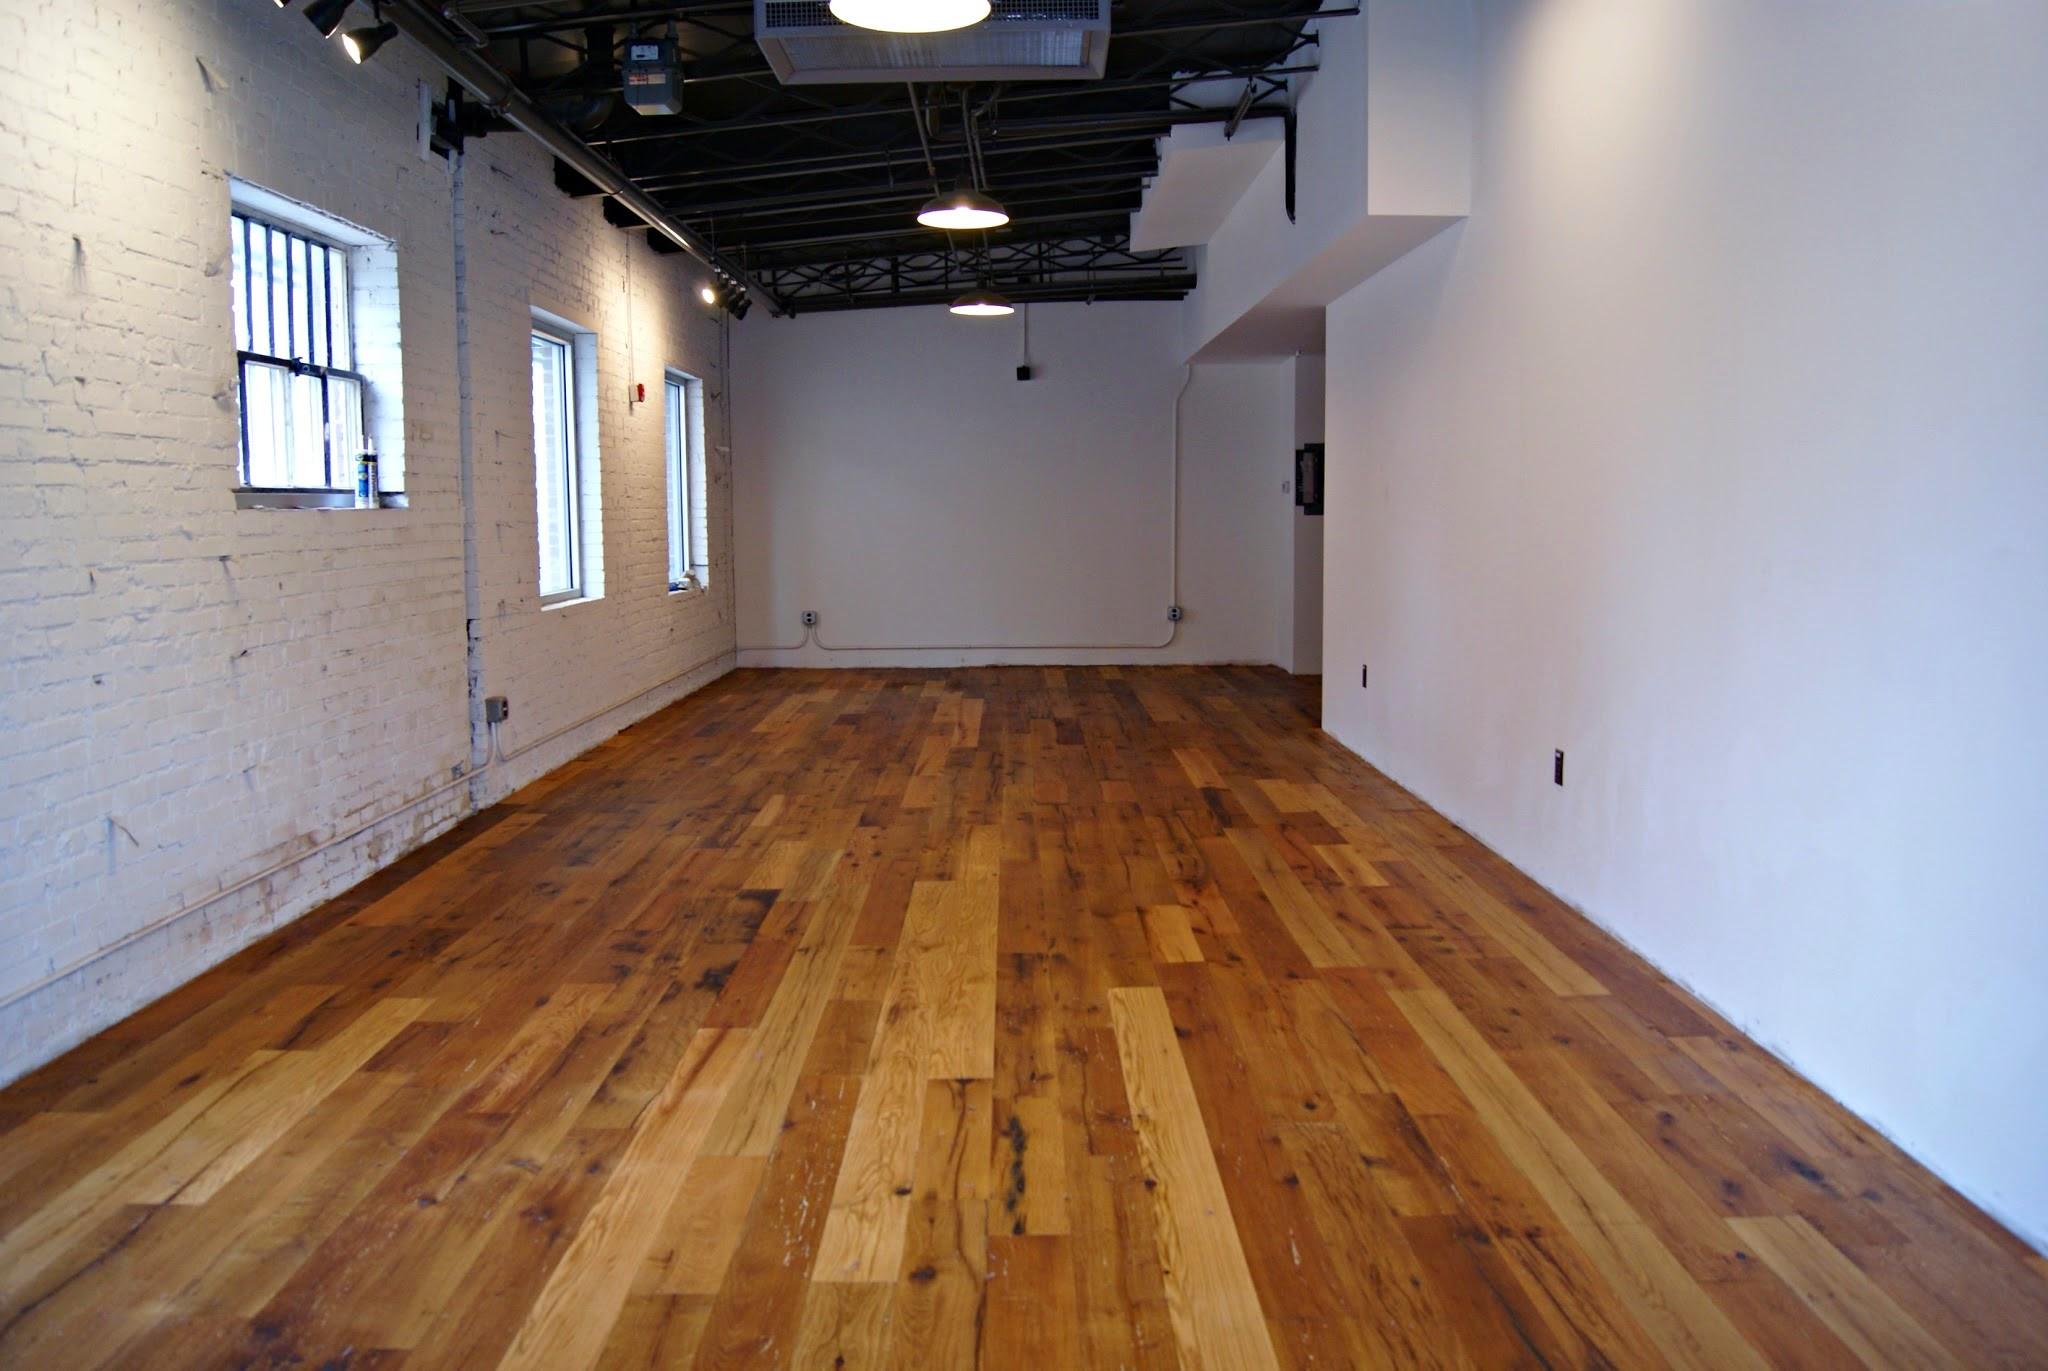 Hardwood Flooring Kitchener Flooring In Nashville Tn All About Flooring Designs